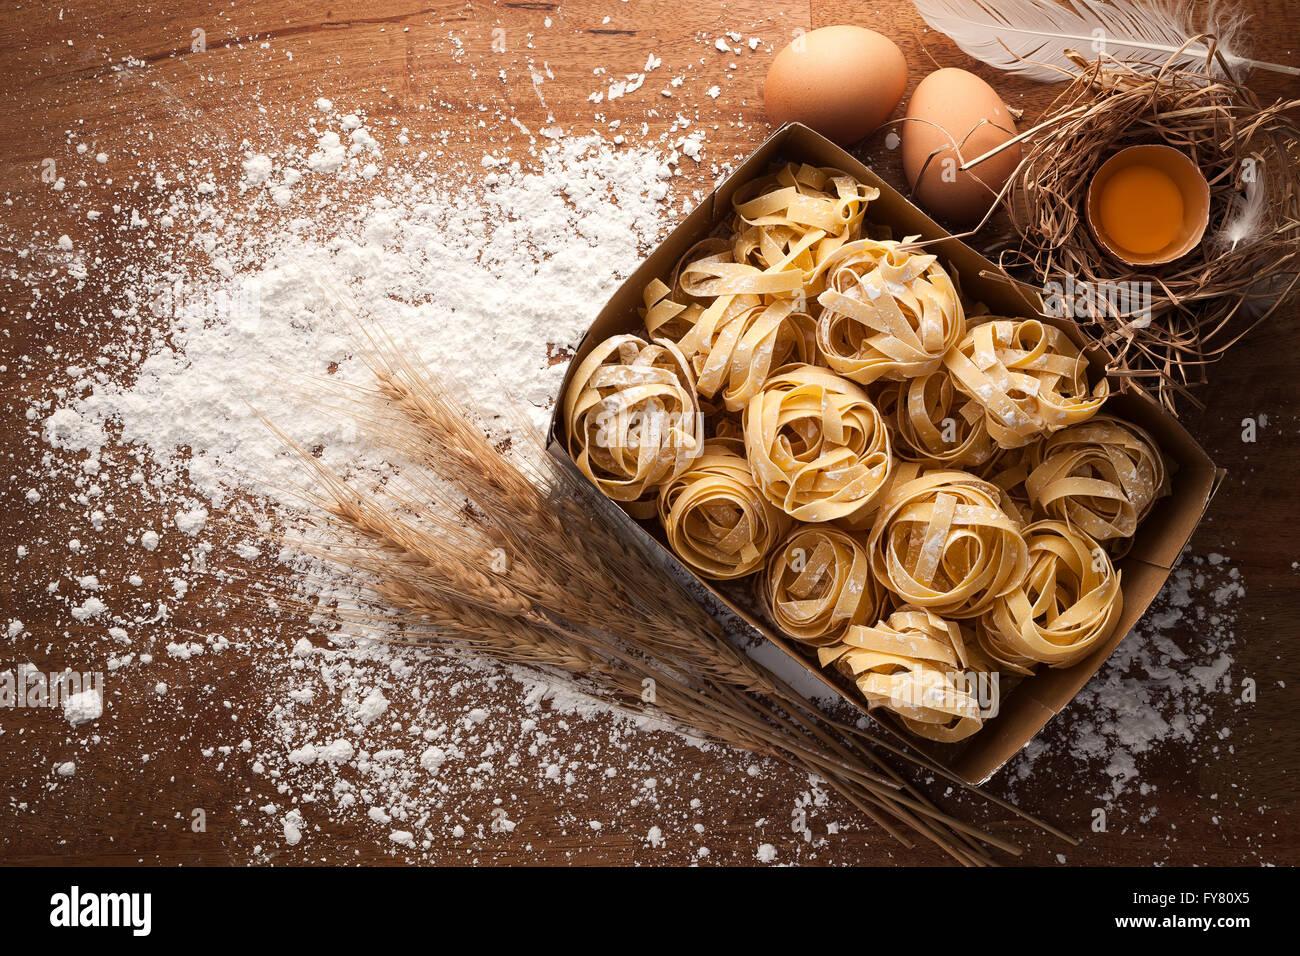 Comida italiana pasta fettuccine todavía la vida rústica madera laicos plana tagliatelle alfredo yema Imagen De Stock